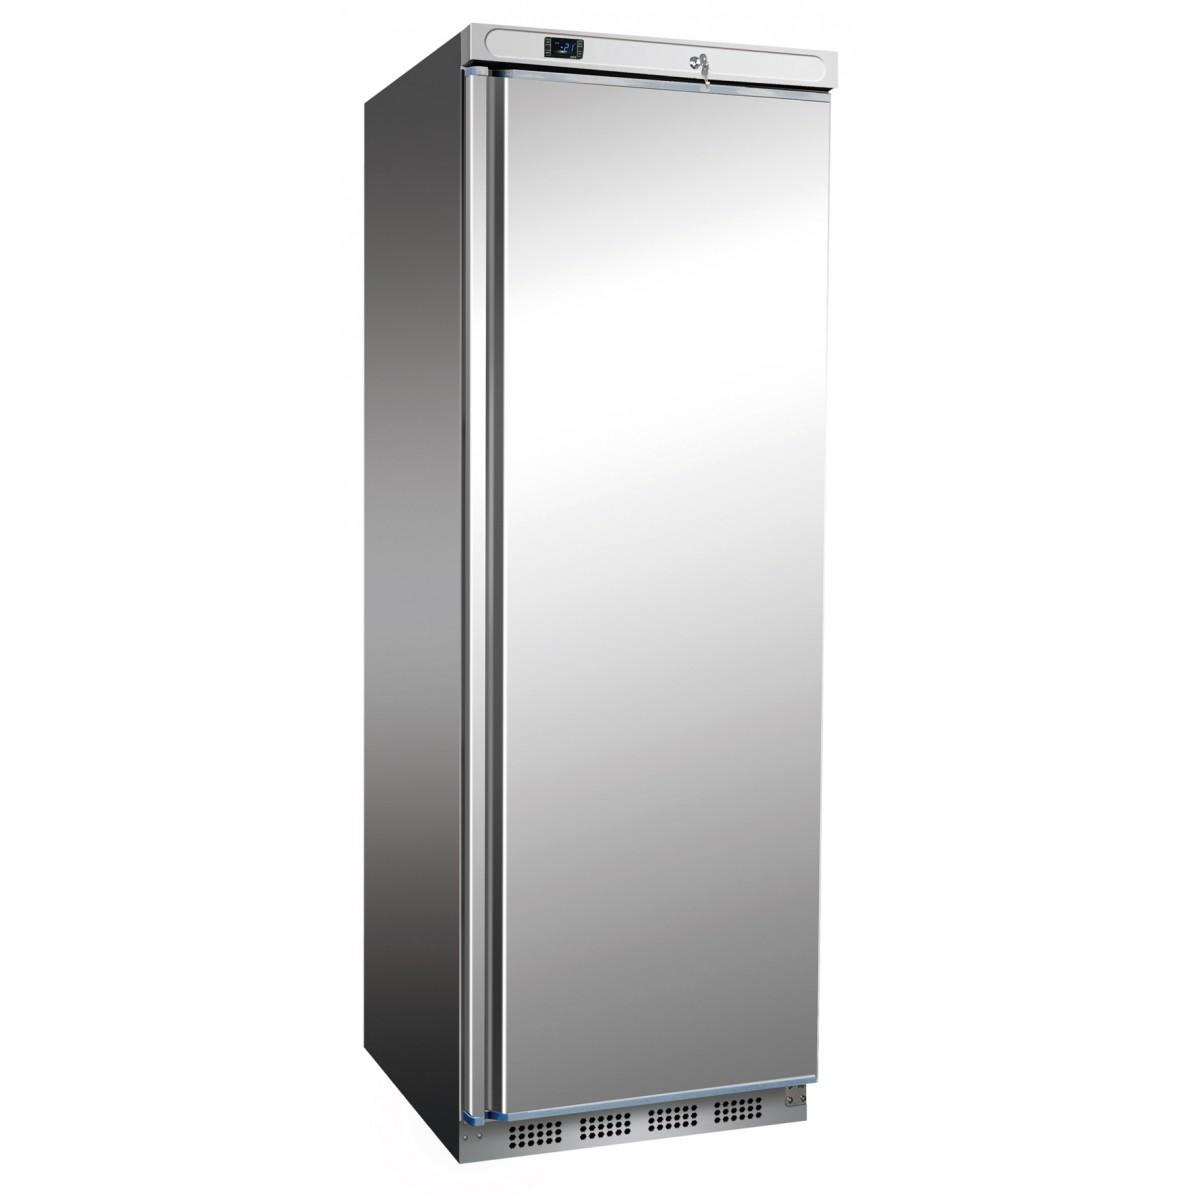 Køleskab | ECO 400 | rustfrit stål | konvektion